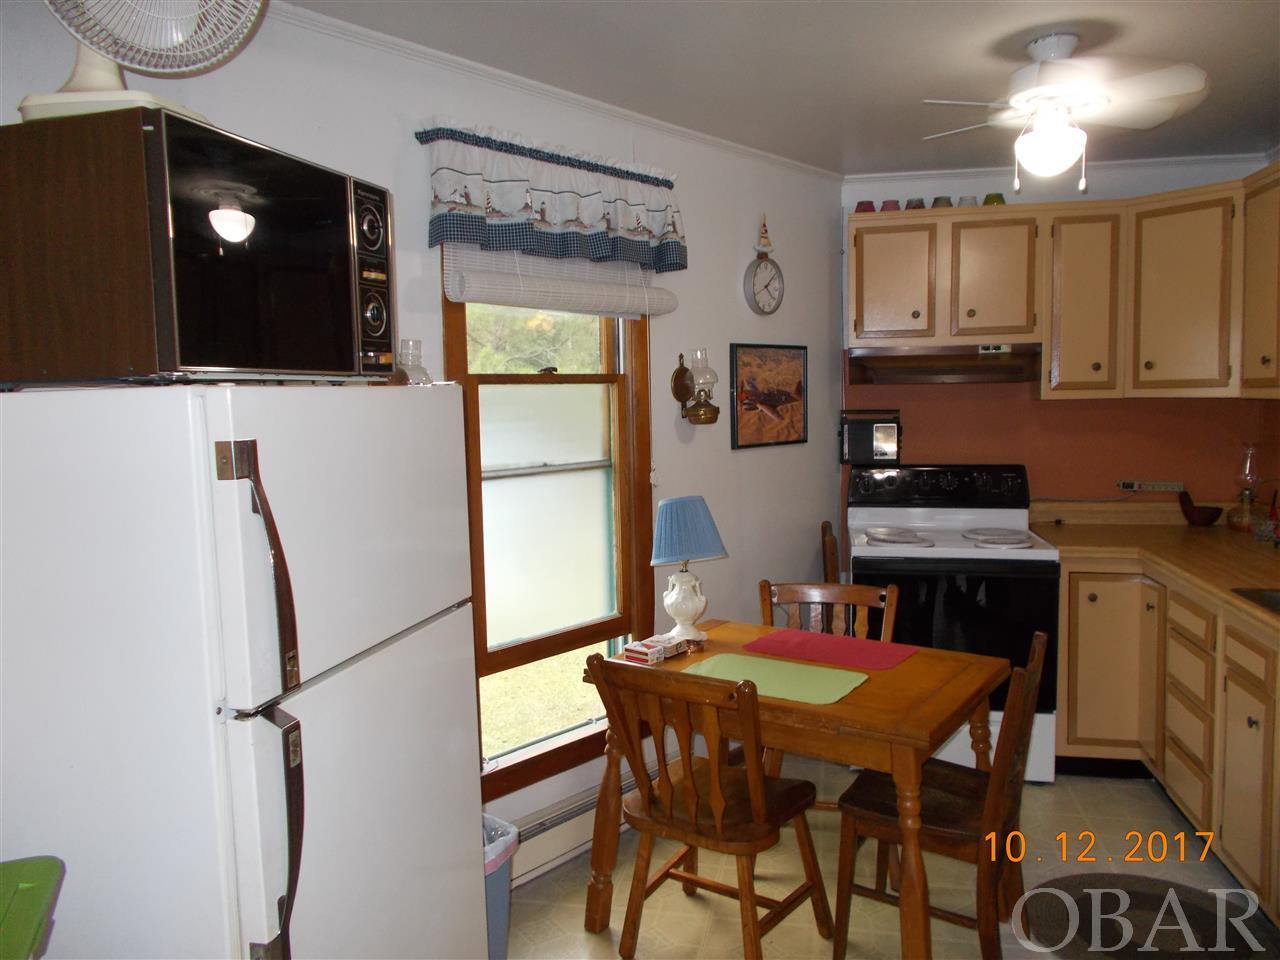 107 Sailboat Road,Shiloh,NC 27974,1 BathroomBathrooms,Residential,Sailboat Road,98138